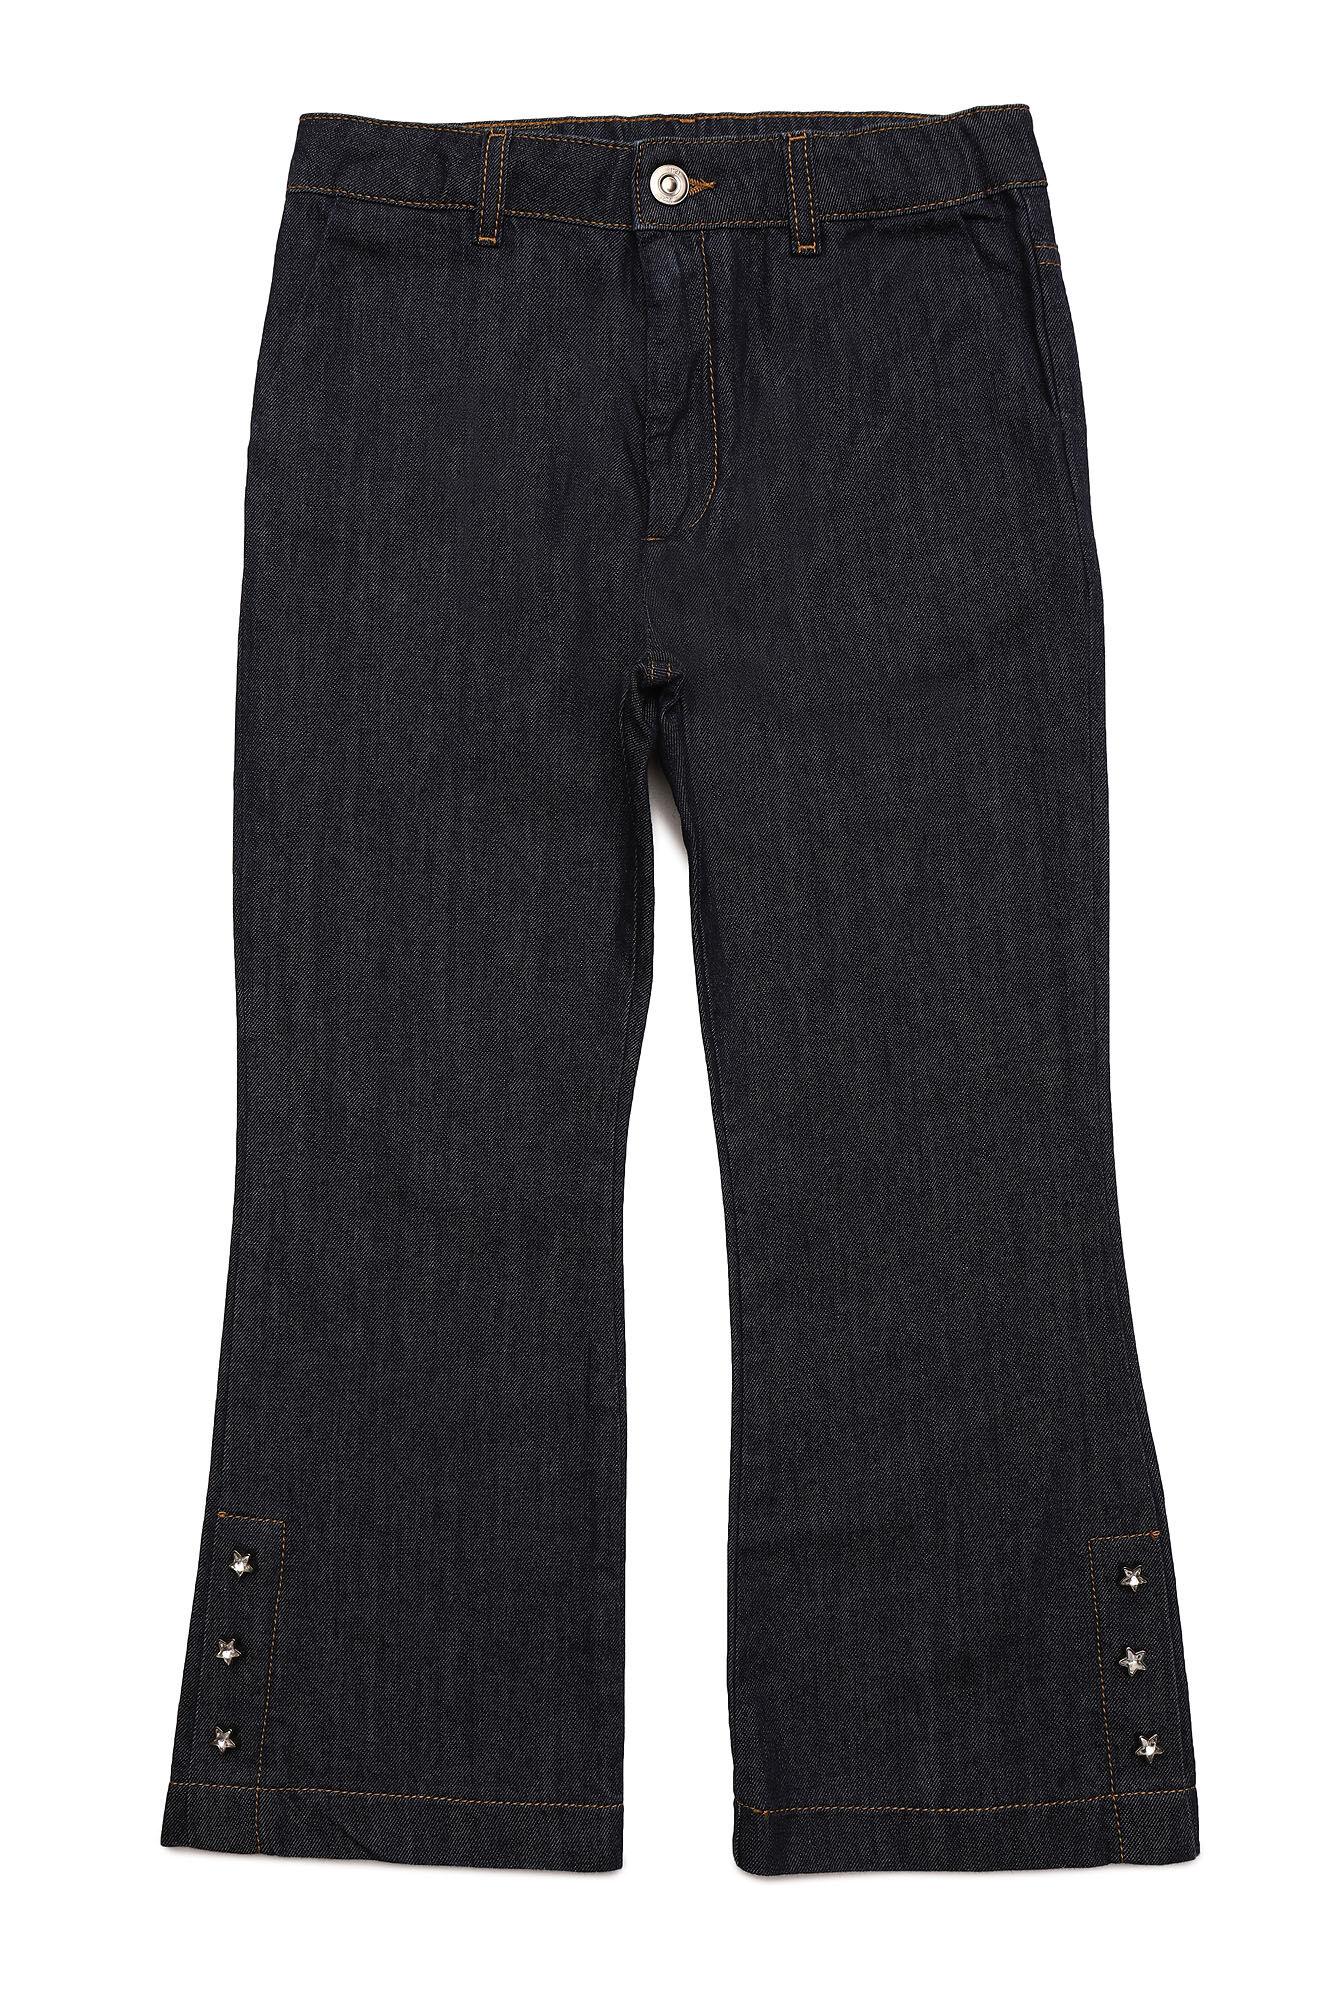 Pantaloni - N21 Junior